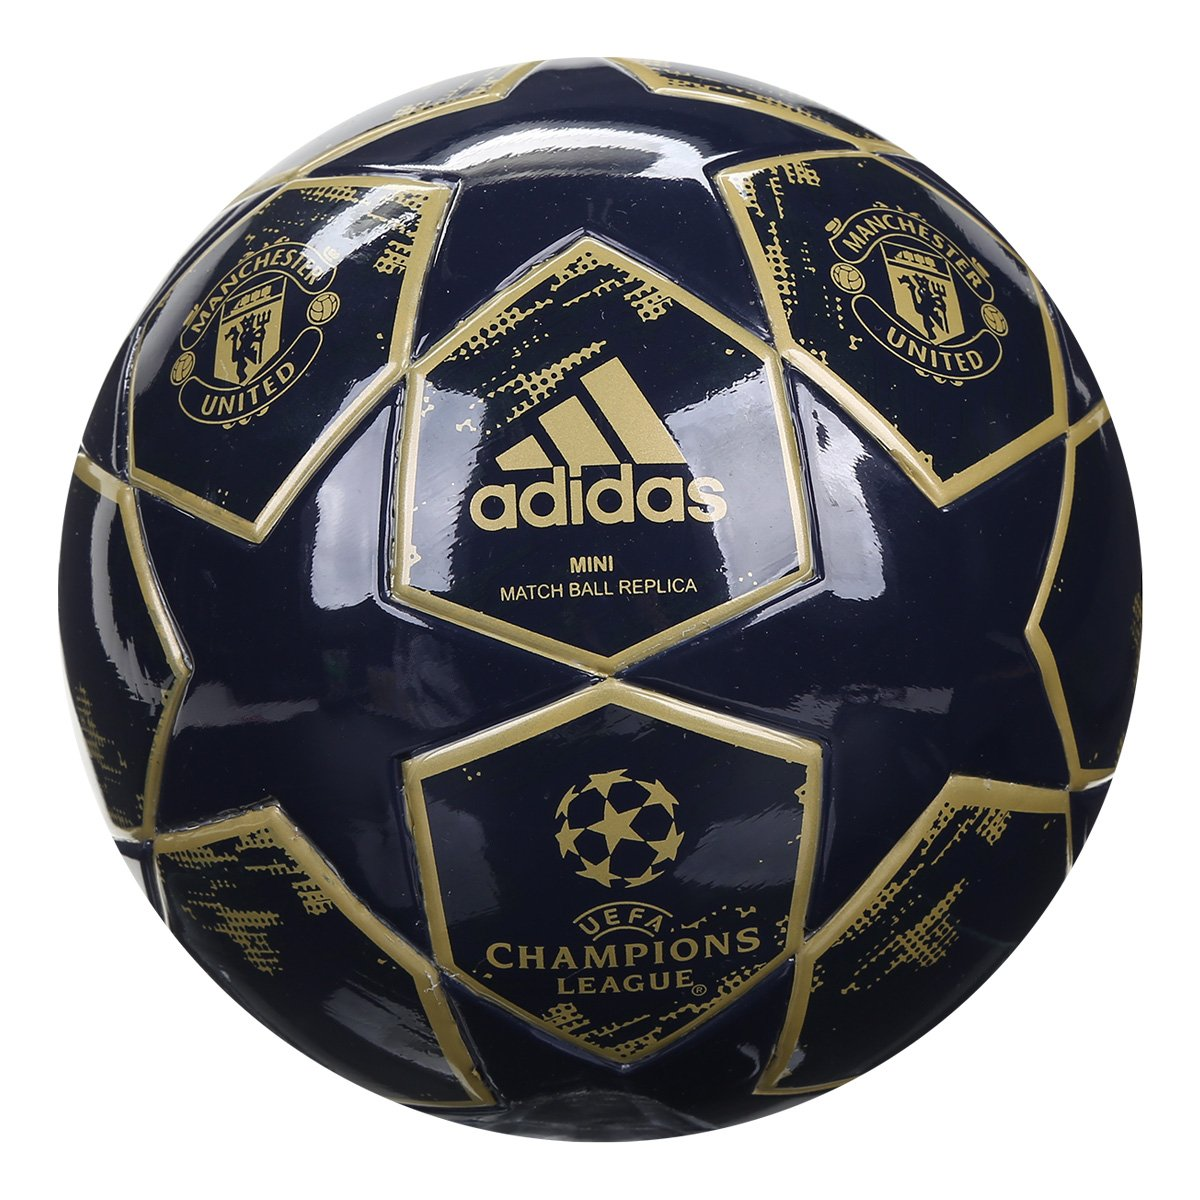 Mini Bola de Futebol Manchester United Adidas Finale 18 - Marinho ... f8a44c8c1dfa1